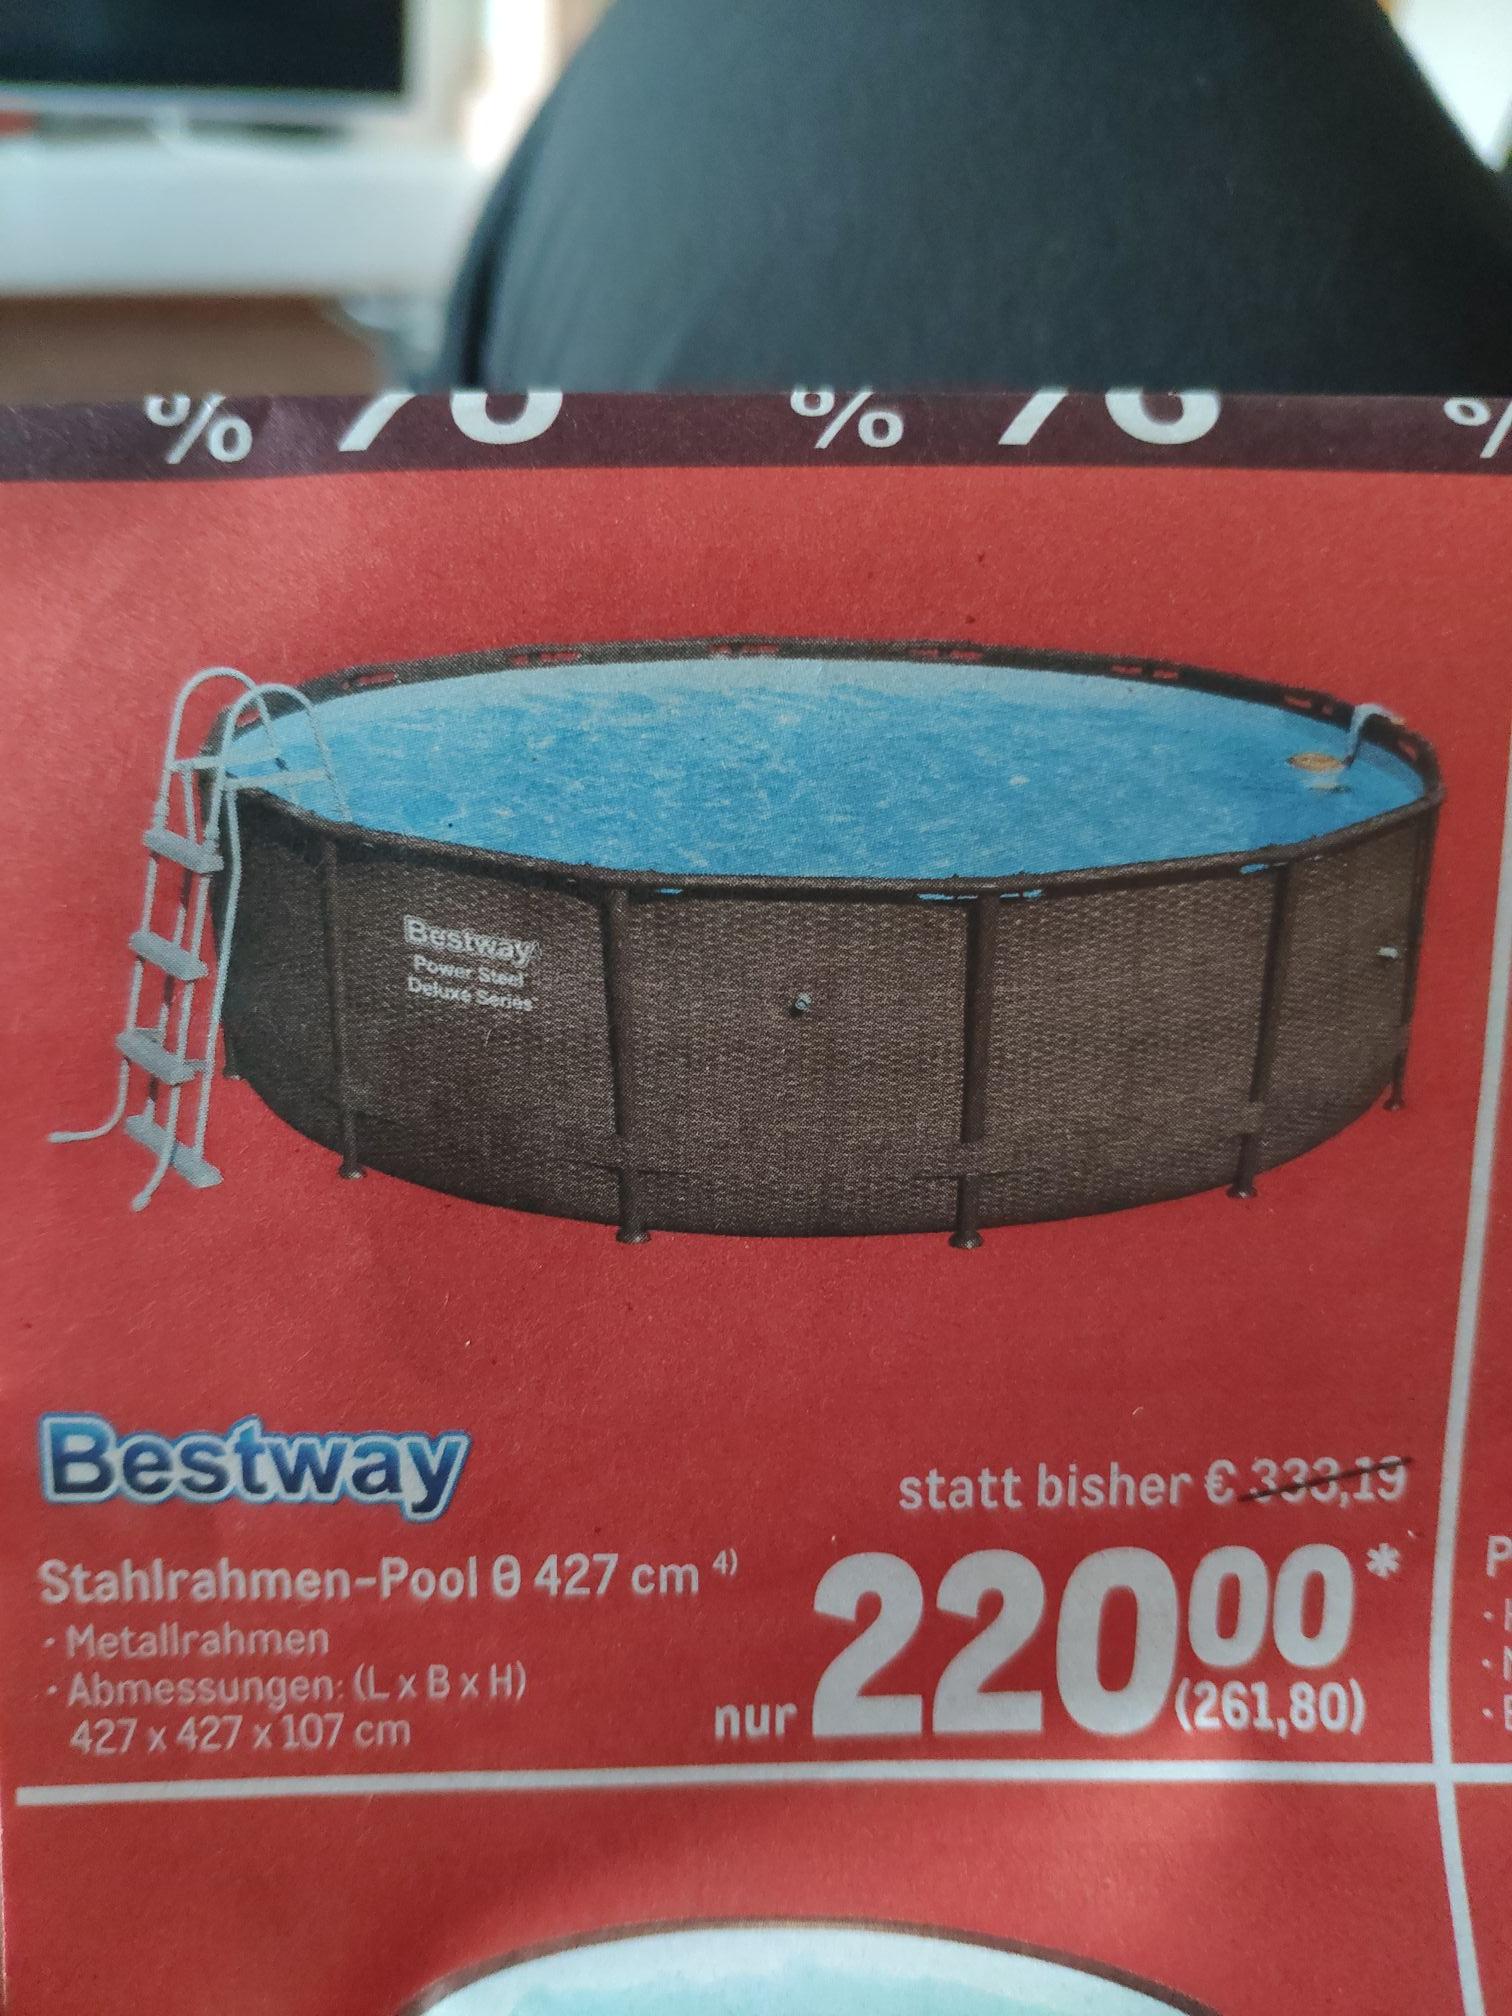 (Offline Metro) Bestway Stahlrahmen-Pool d 427 für 261,80 Euro